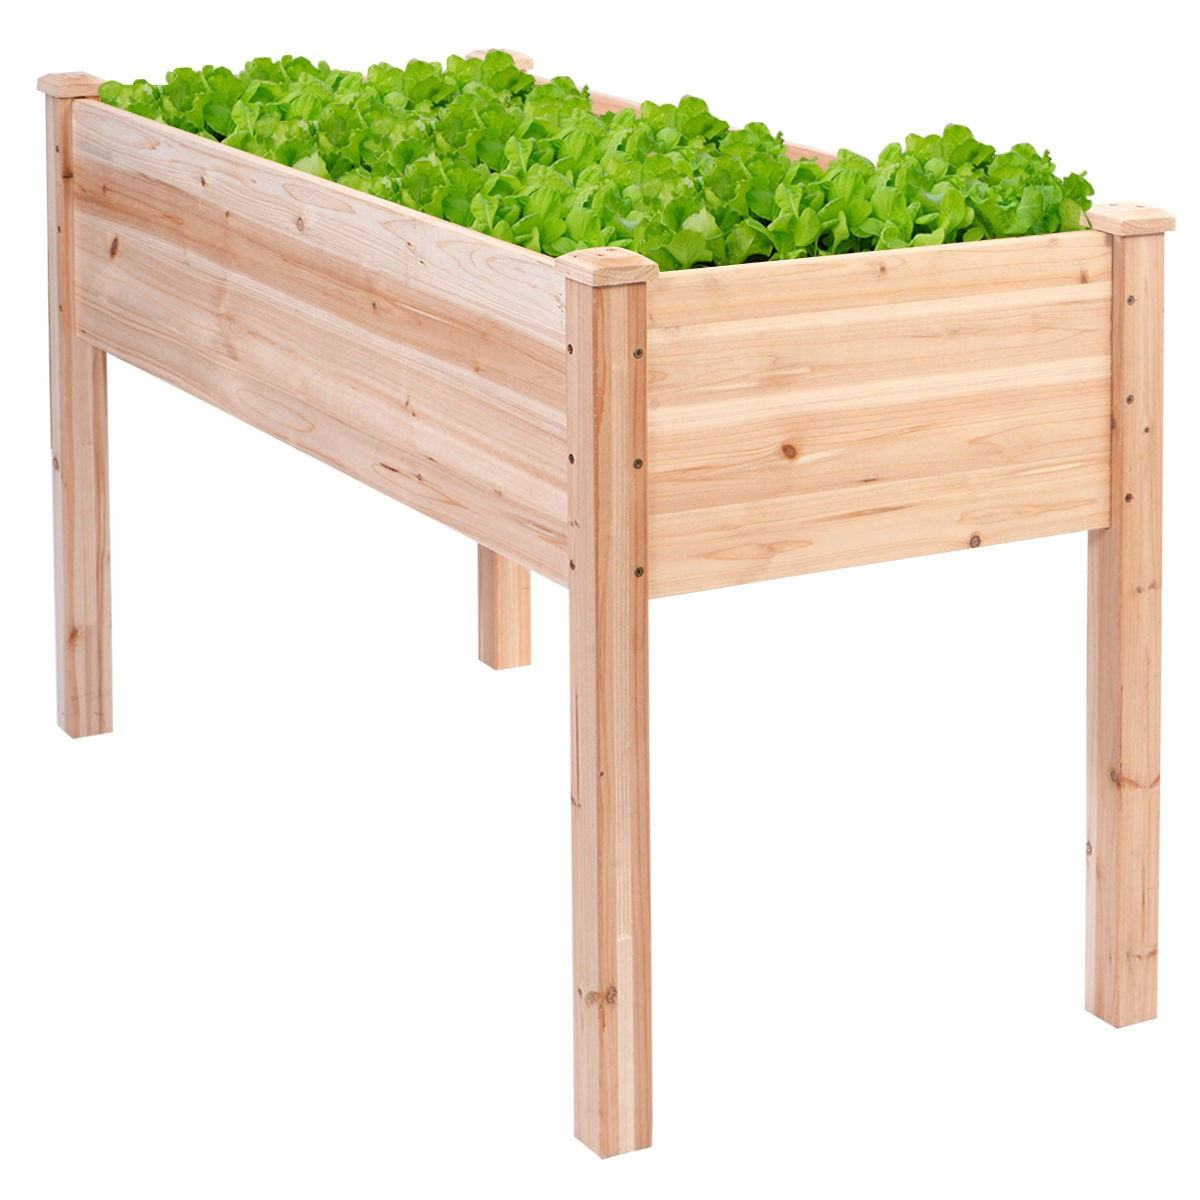 Solid Wood Cedar 30 Inch High Raised Garden Bed Planter Box    FastFurnishings.com